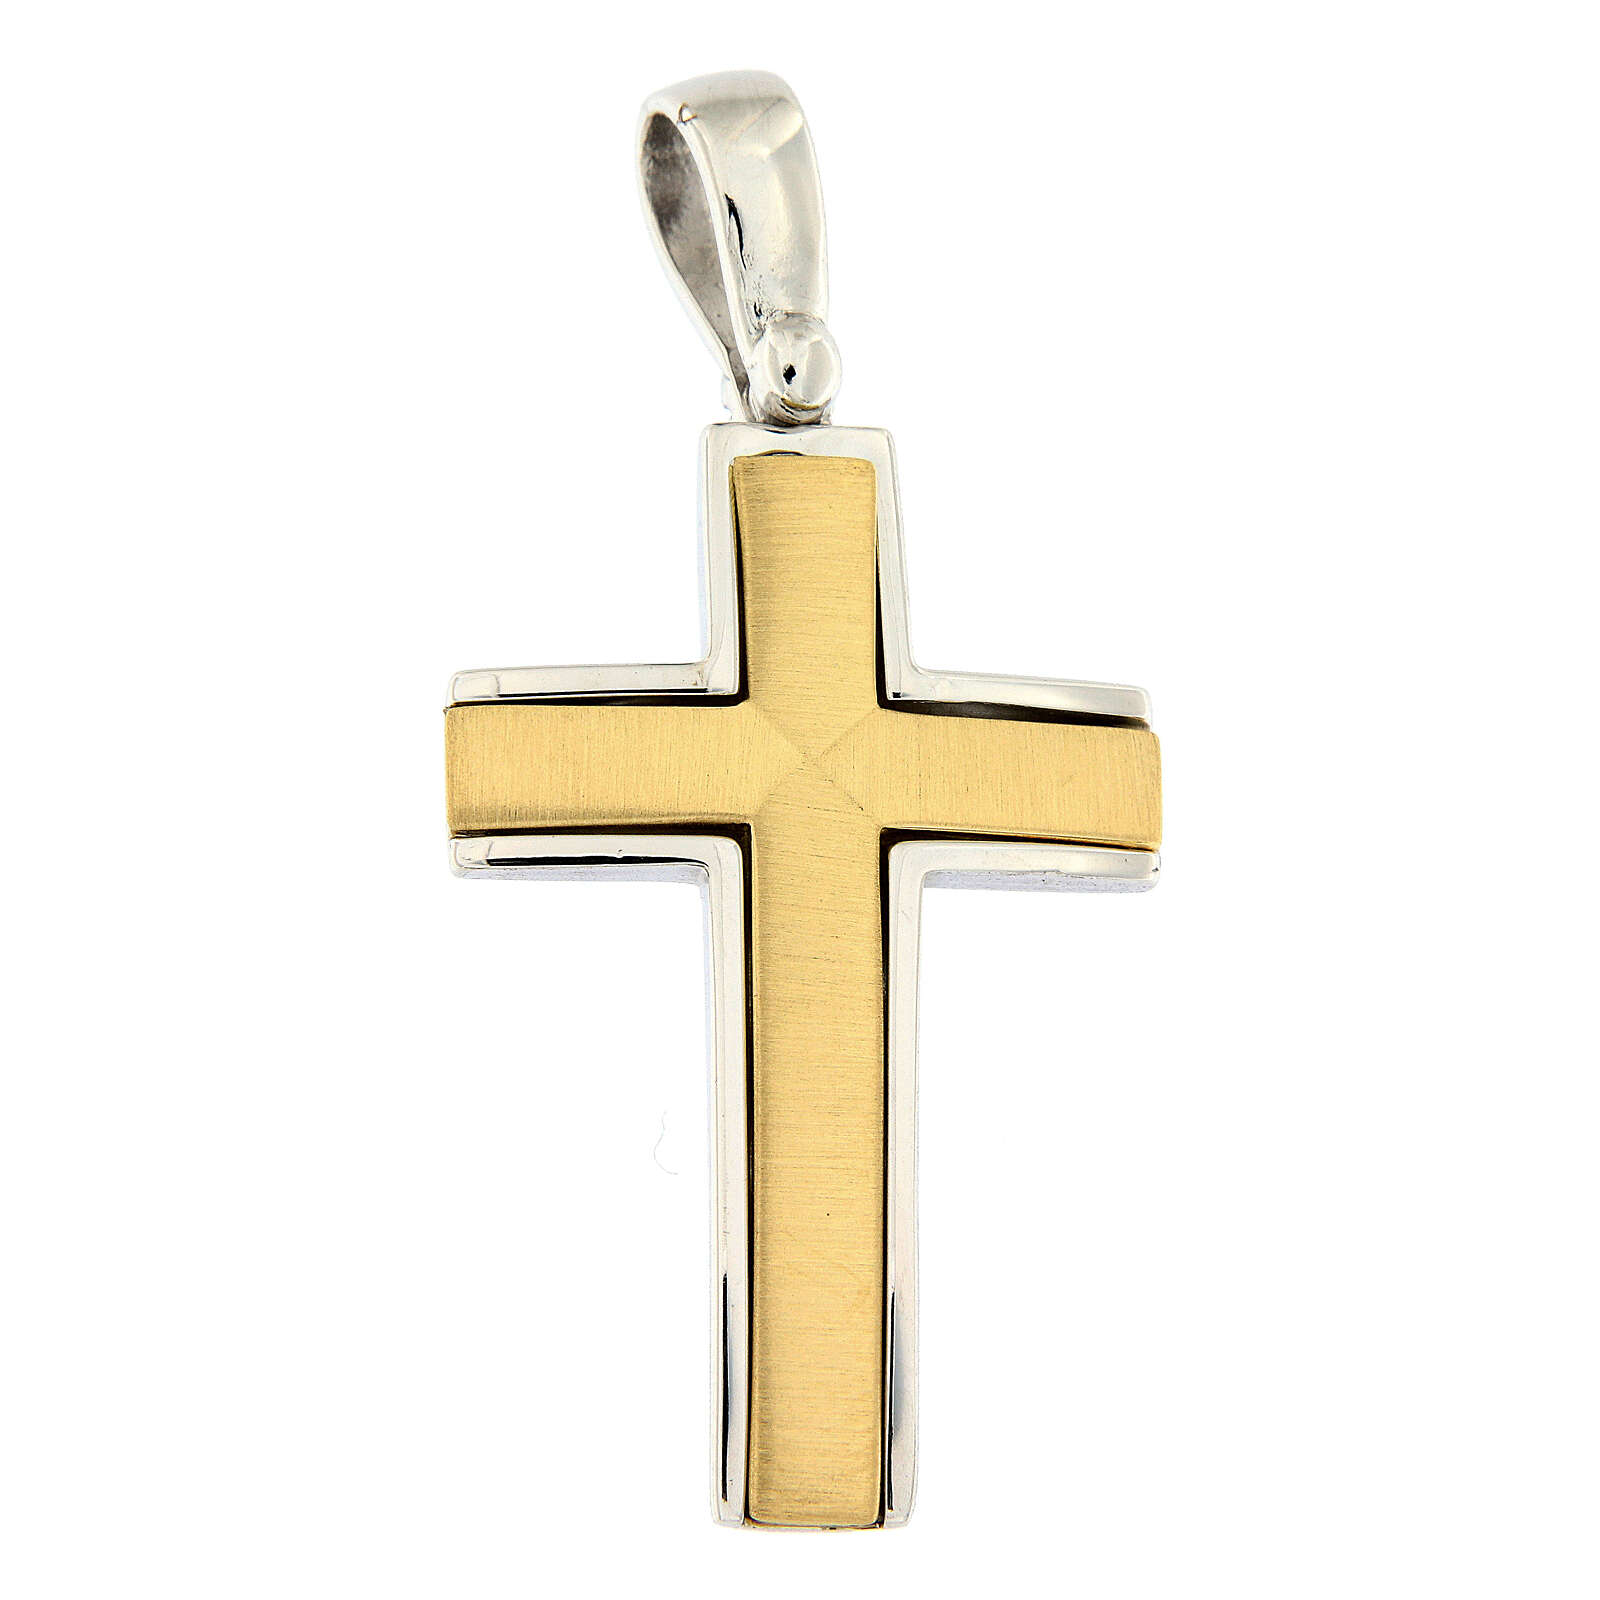 Colgante cruz satinada oro 18 k bicolor cruce central 7,5 gr 4